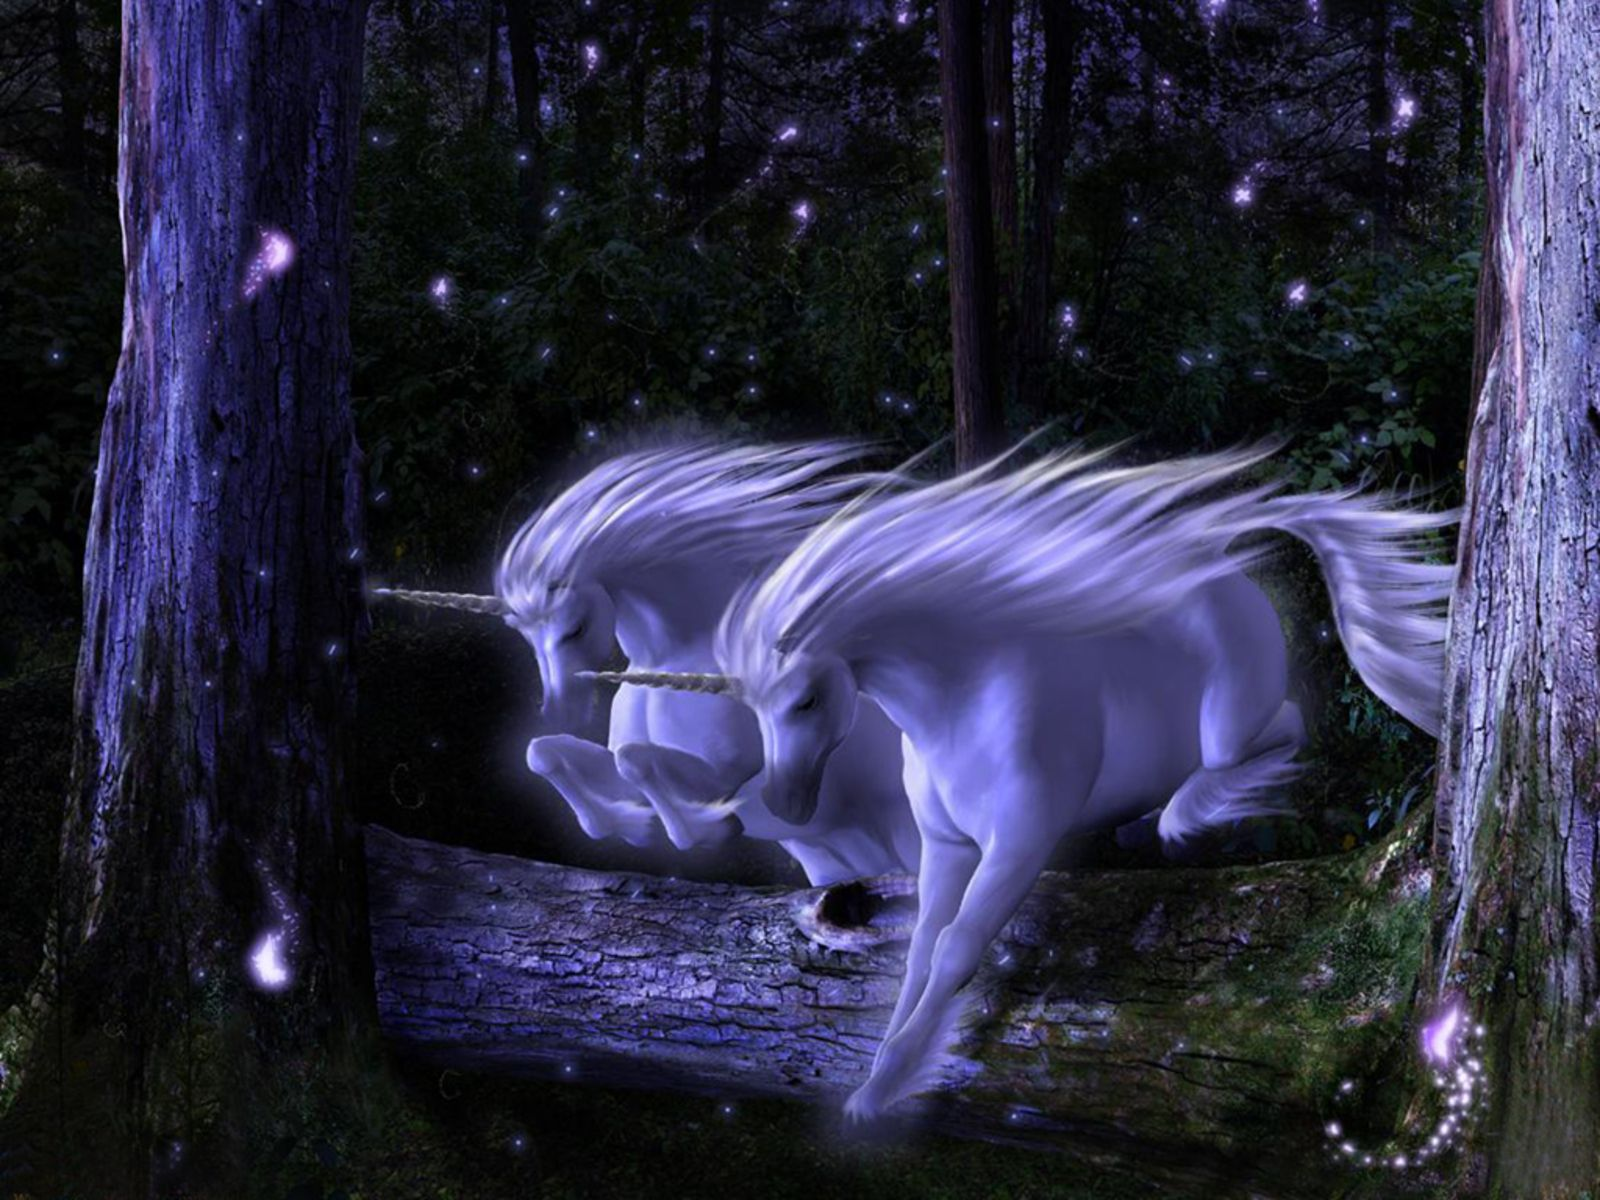 Cool Wallpaper Horse Unicorn - 7039f841d87be11016c7410a2ba68f0e  Snapshot_854848.jpg